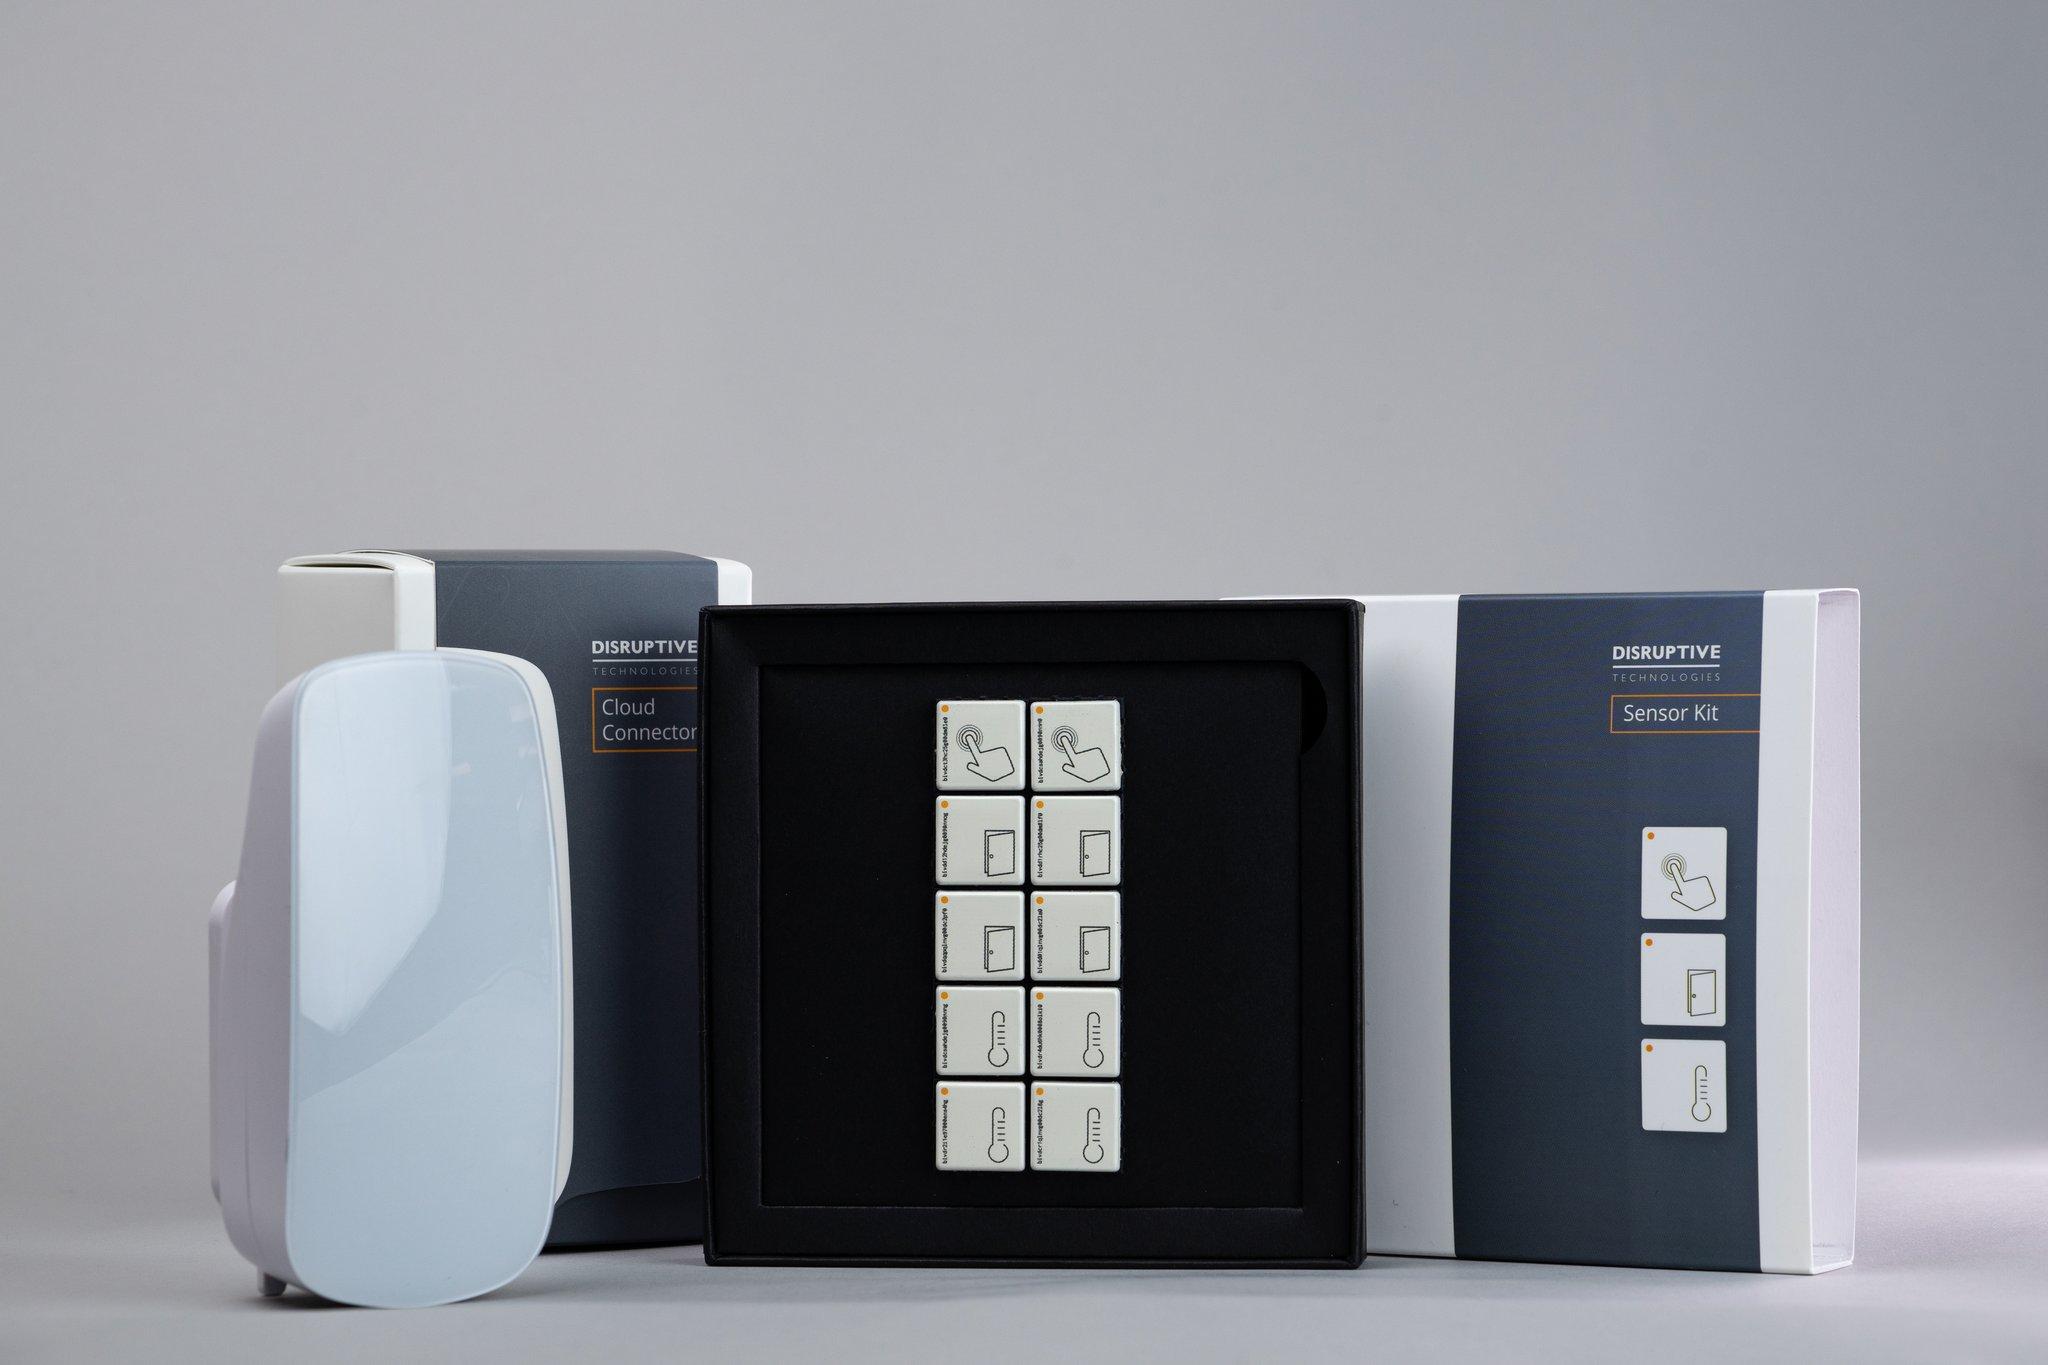 disruptive technologies kit